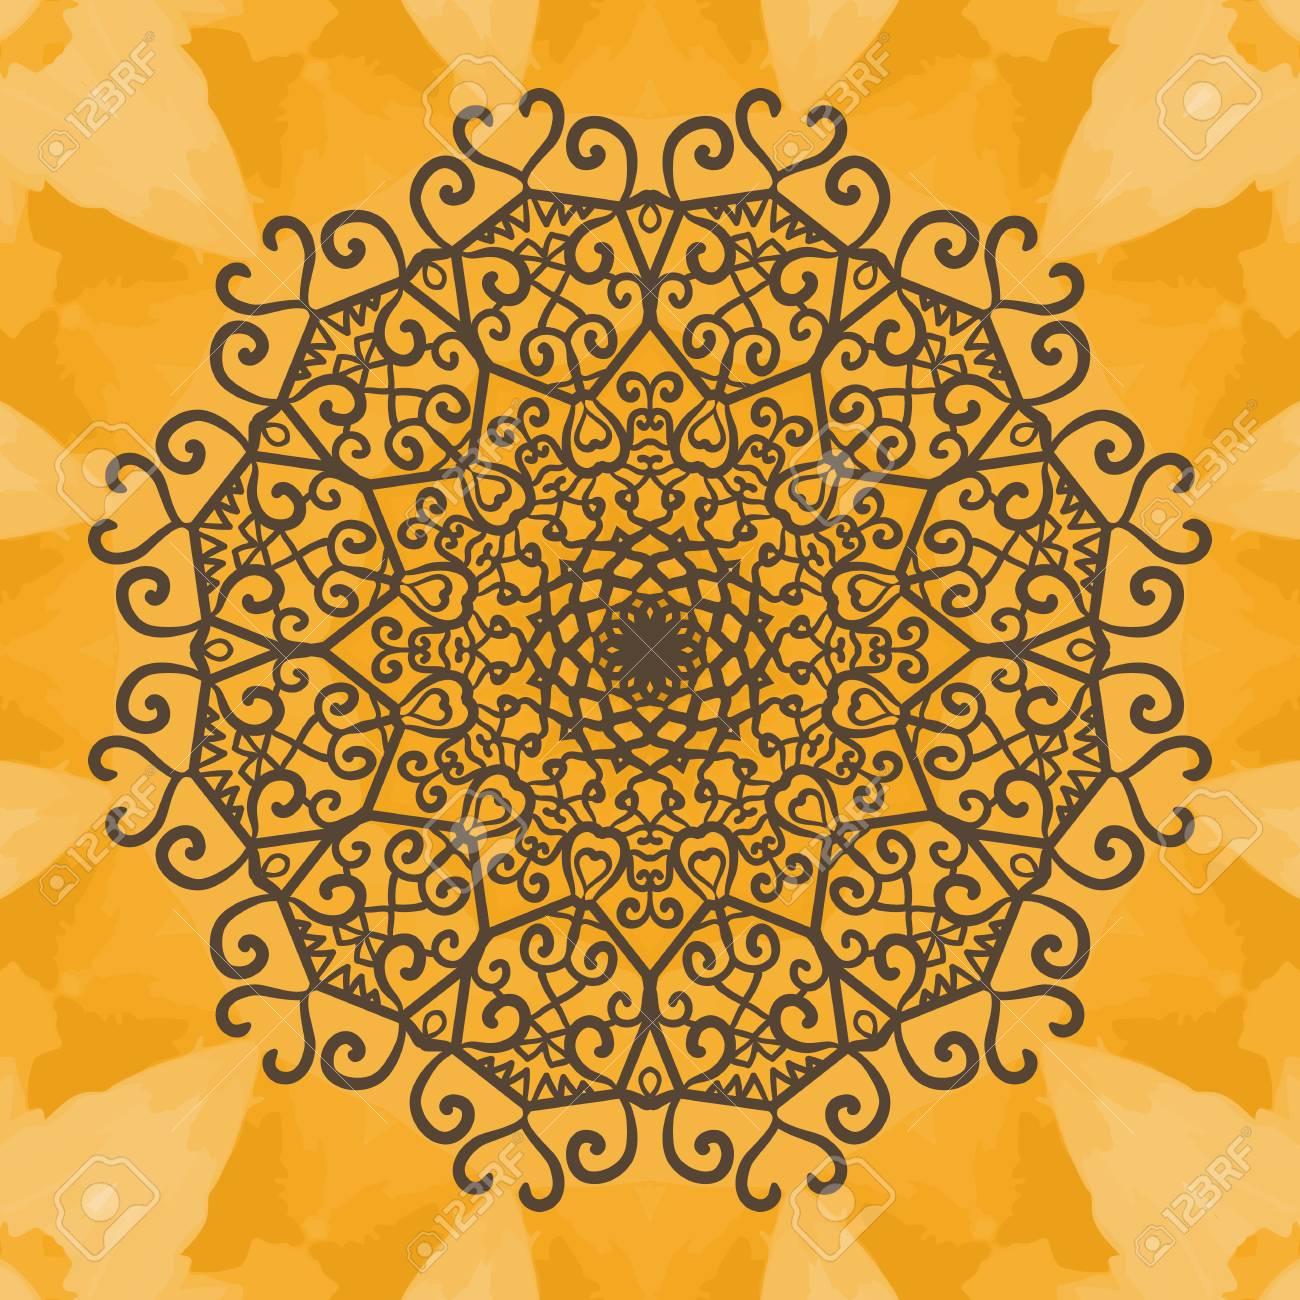 Download 750 Koleksi Background Islami Gold HD Terbaru